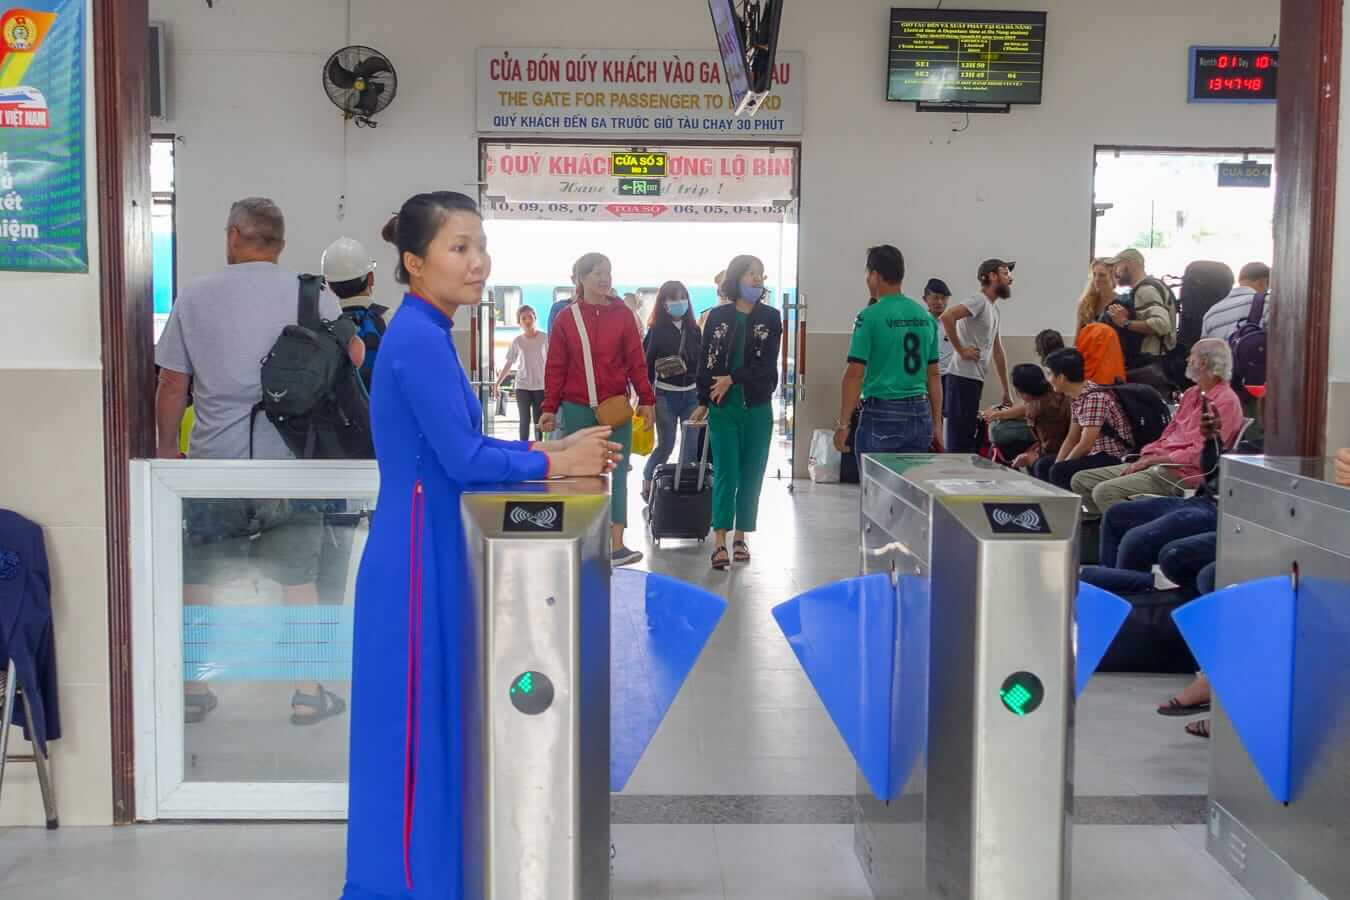 Da Nang train station staff member